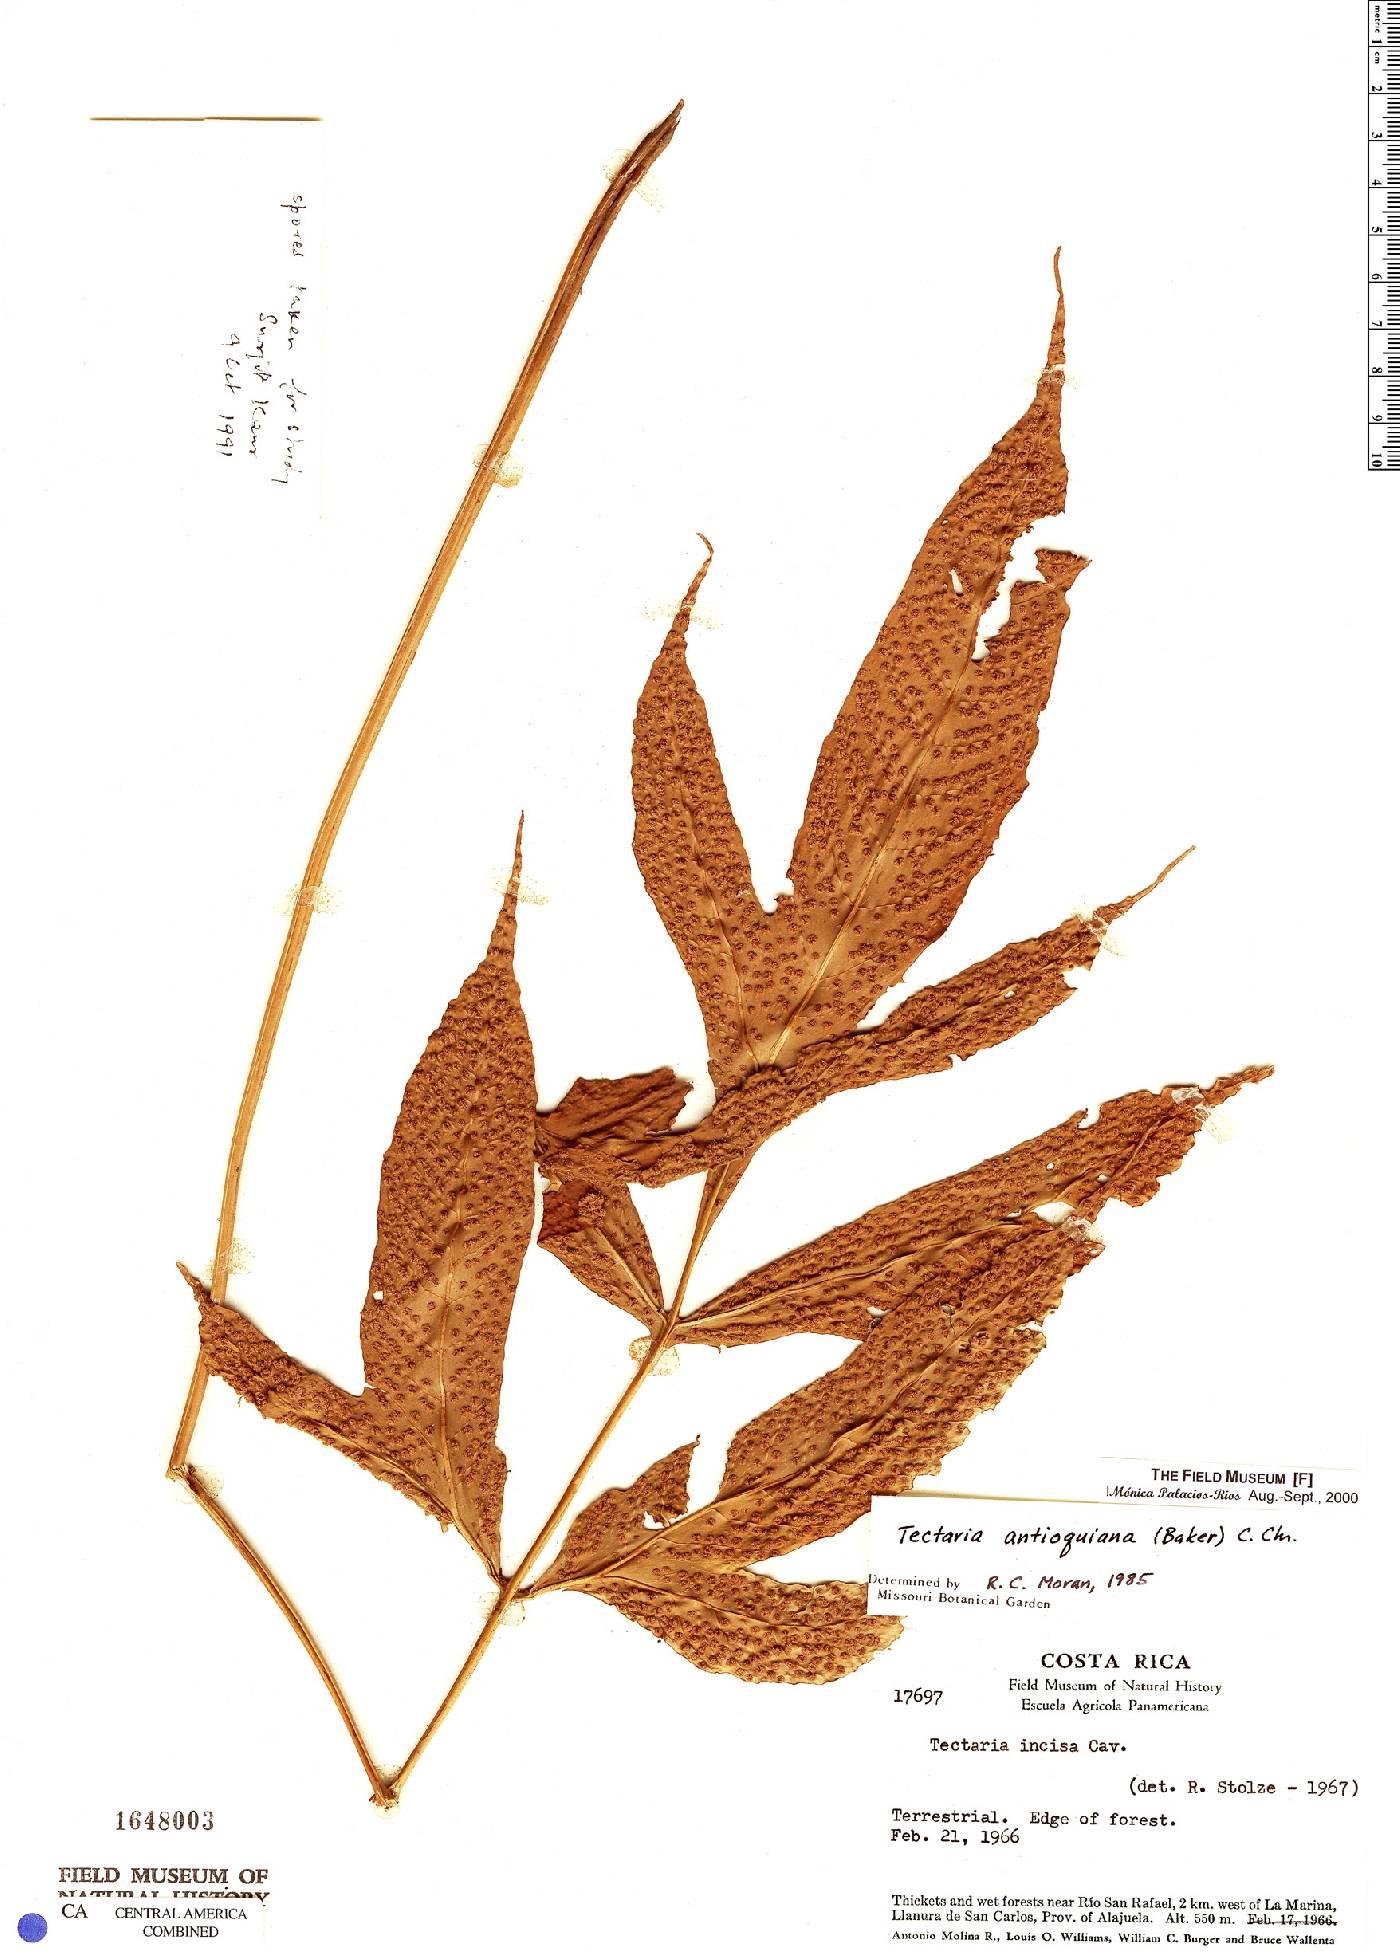 Tectaria antioquoiana image